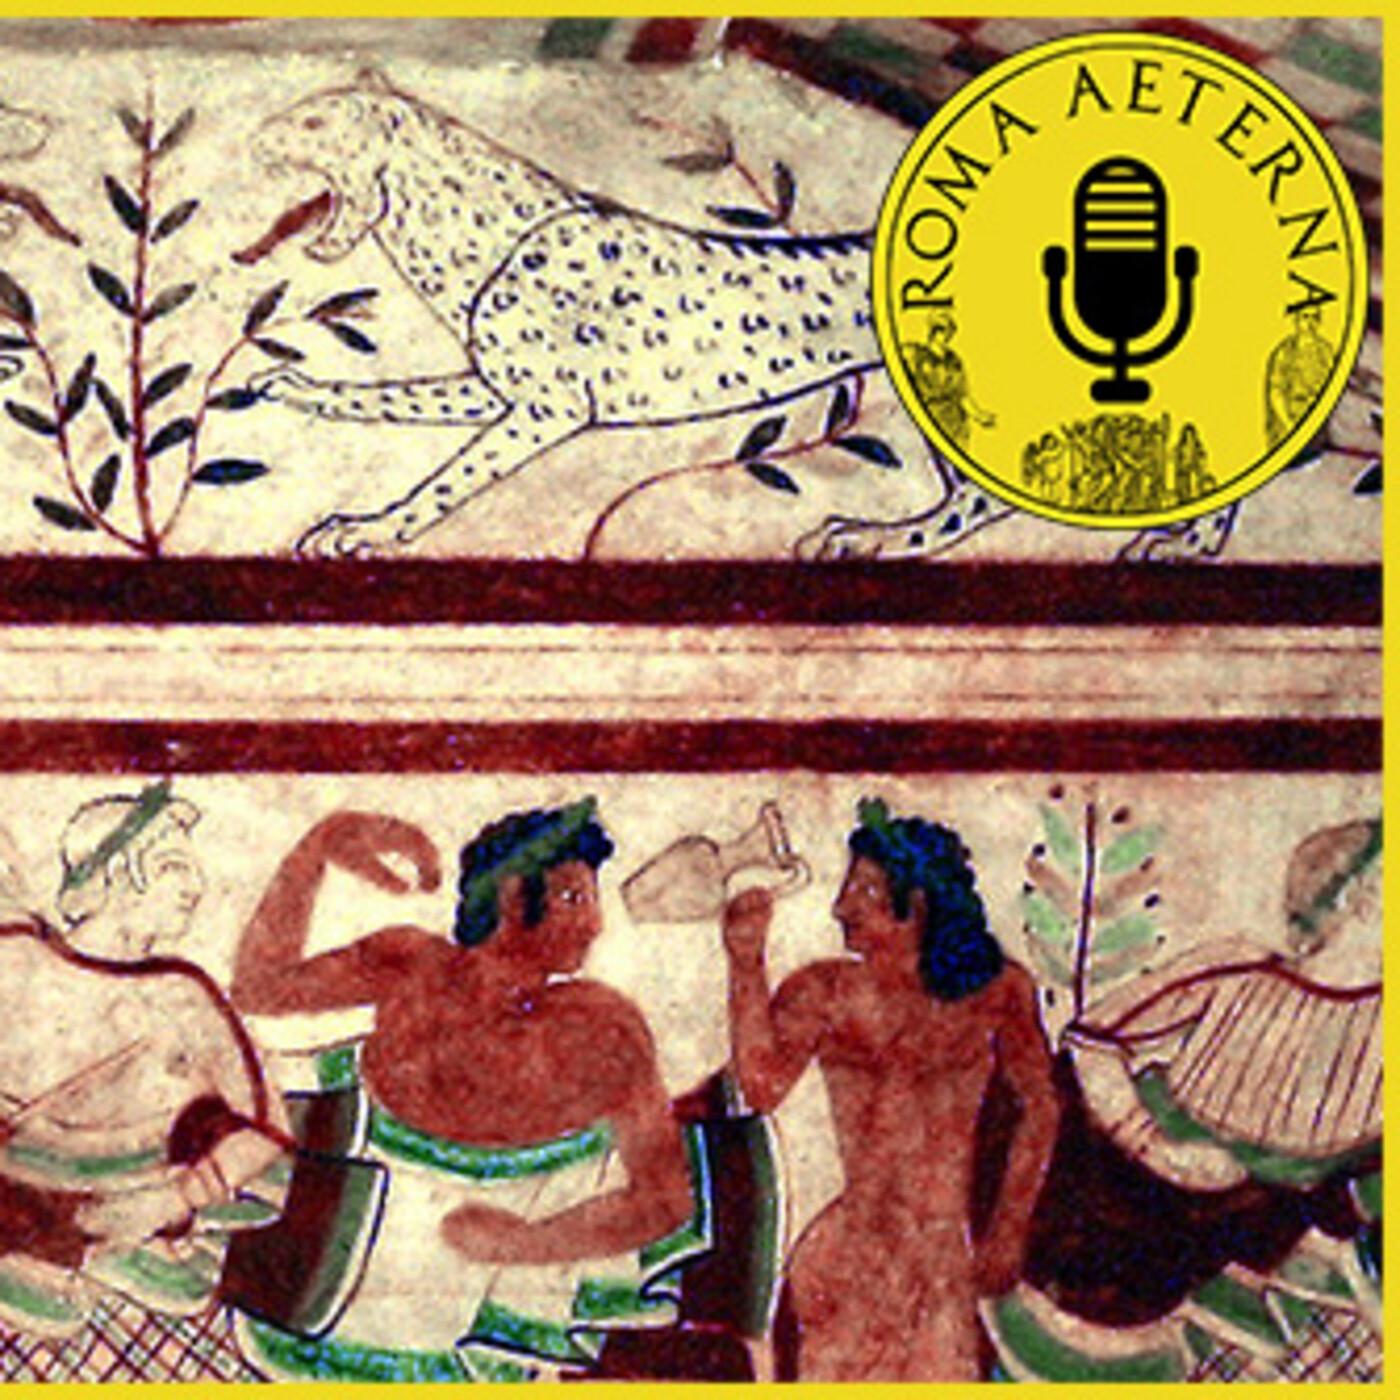 Programa 3 - La Italia prerromana. Etruscos y griegos, ¿padres de Roma?